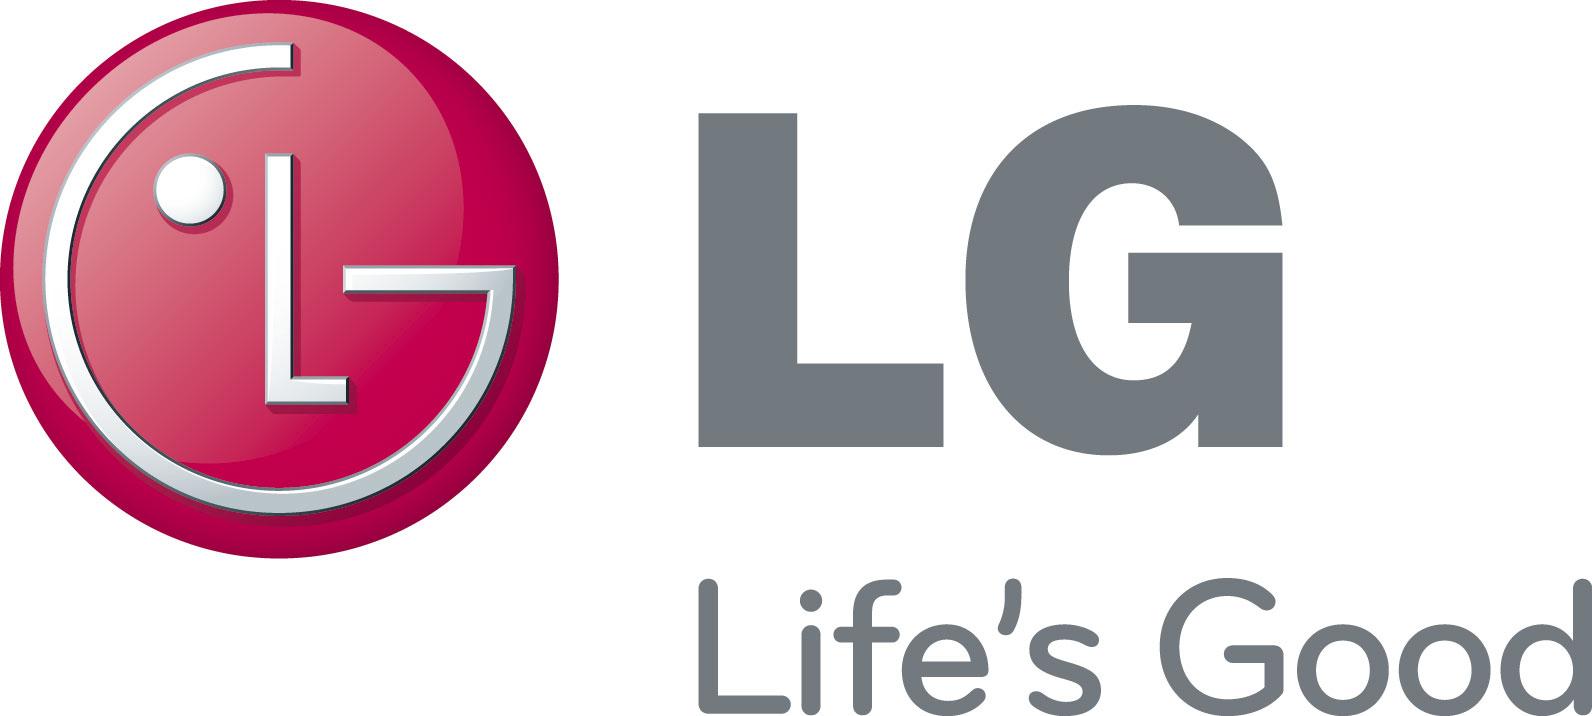 logos explain brand 3